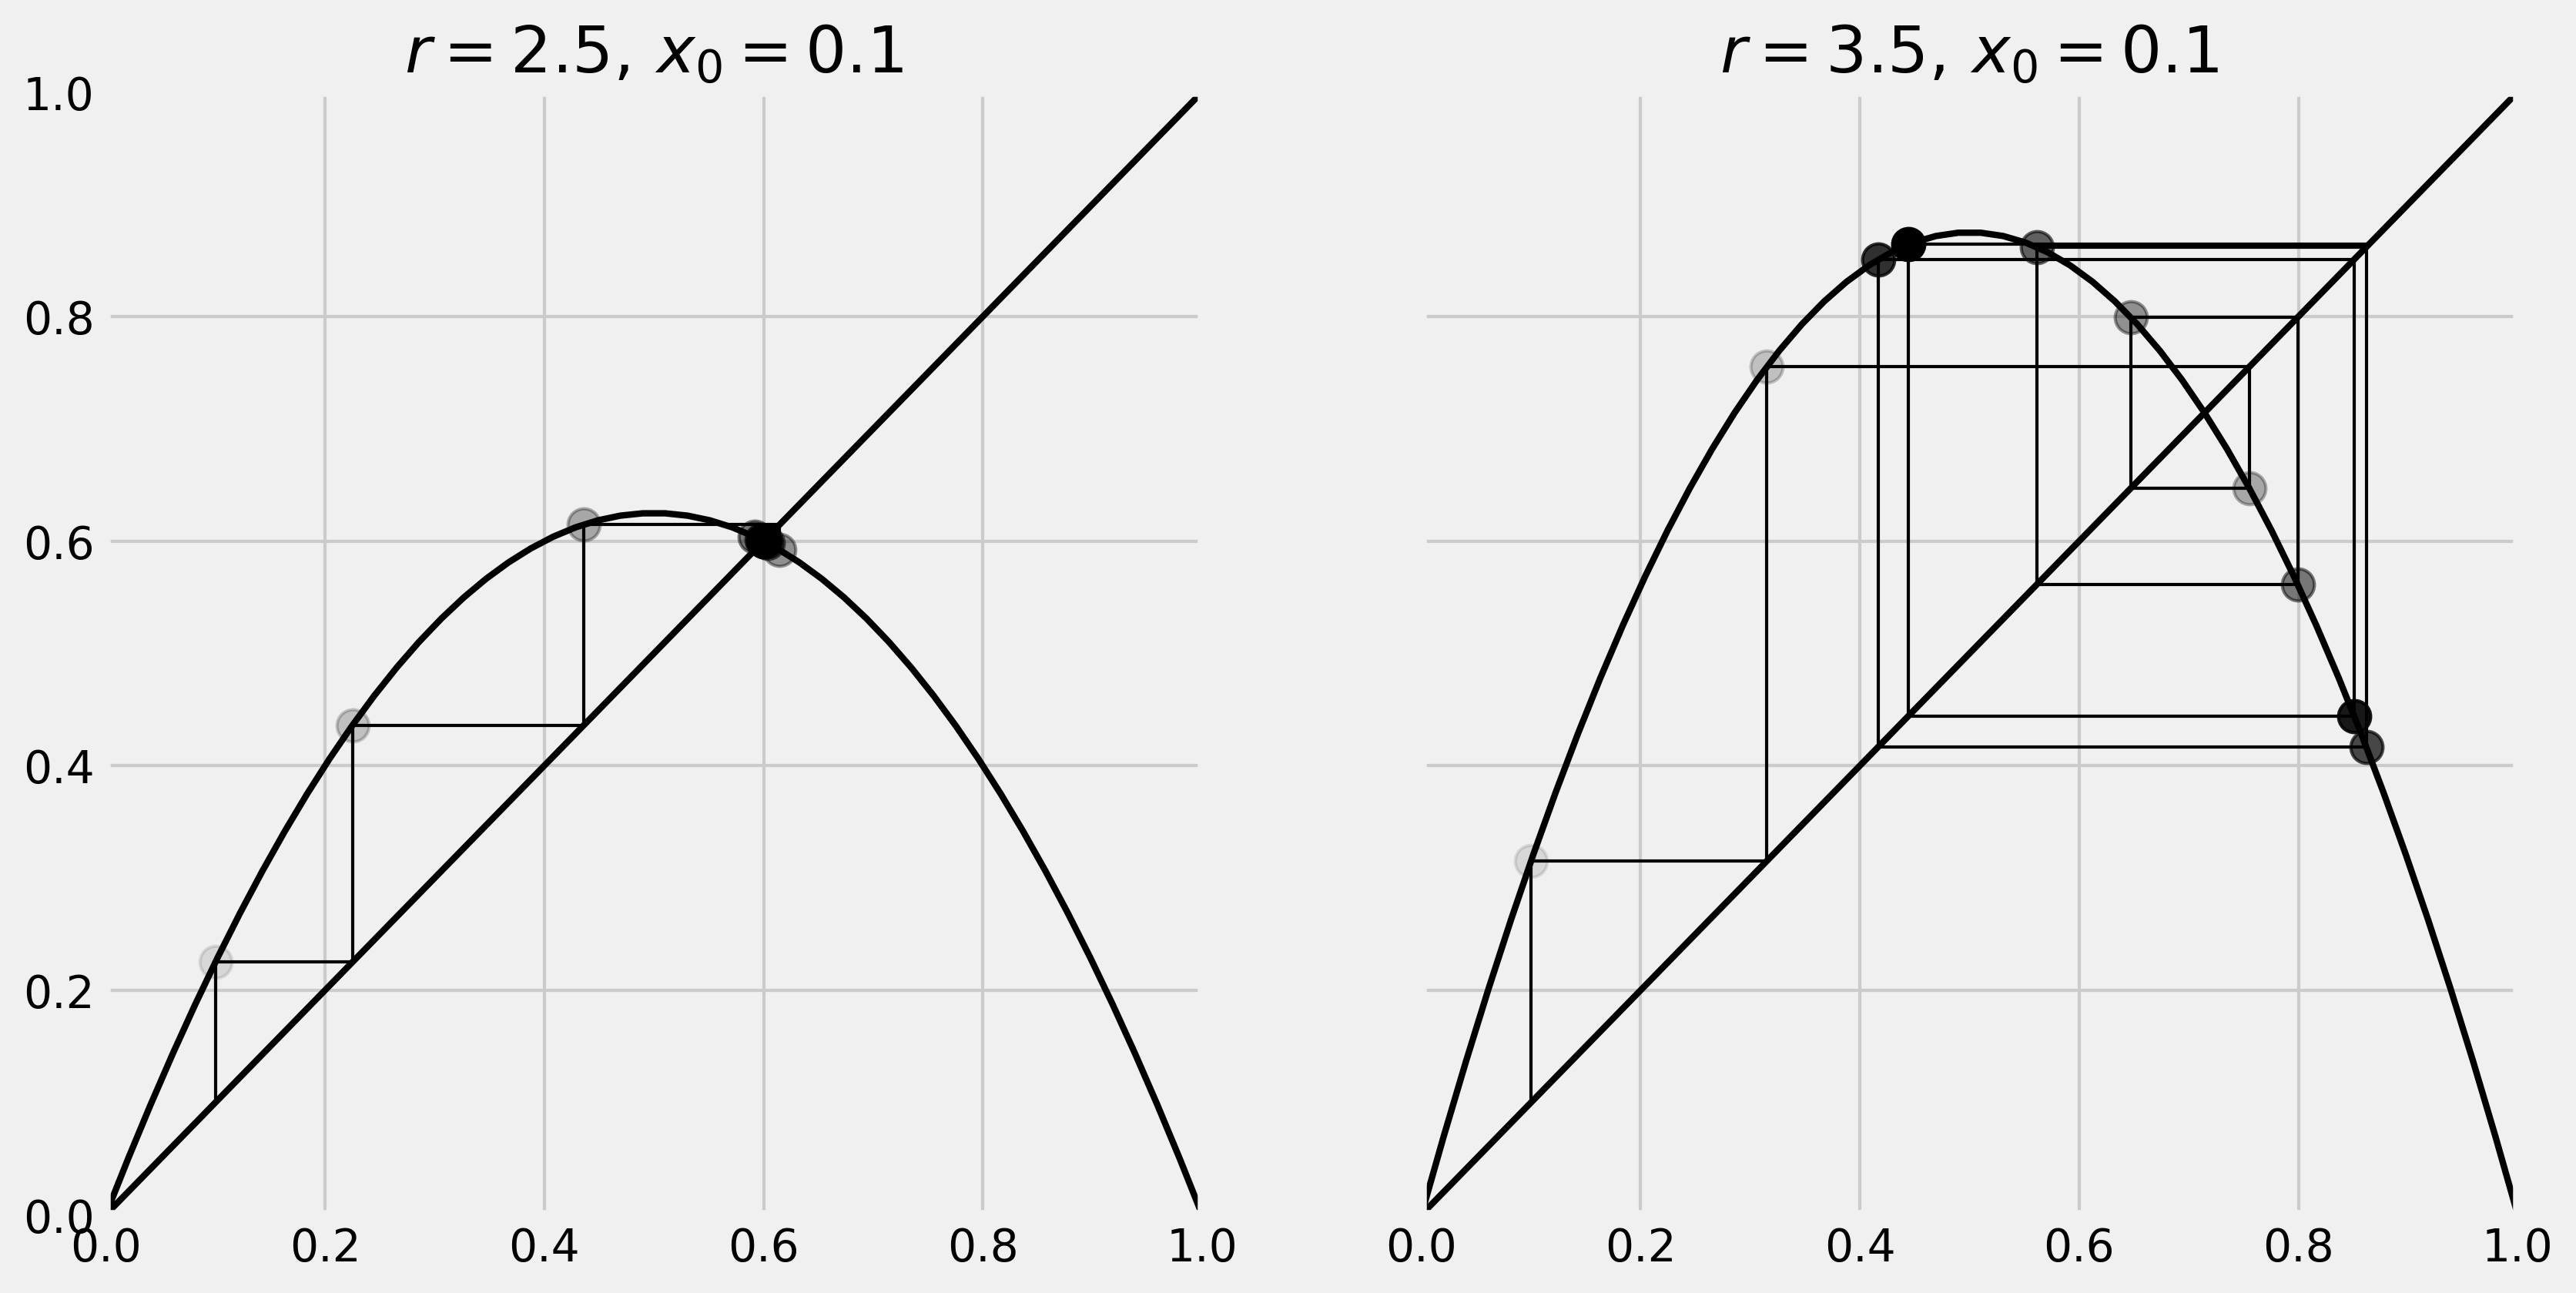 <matplotlib.figure.Figure at 0x7f994e4f7c50>